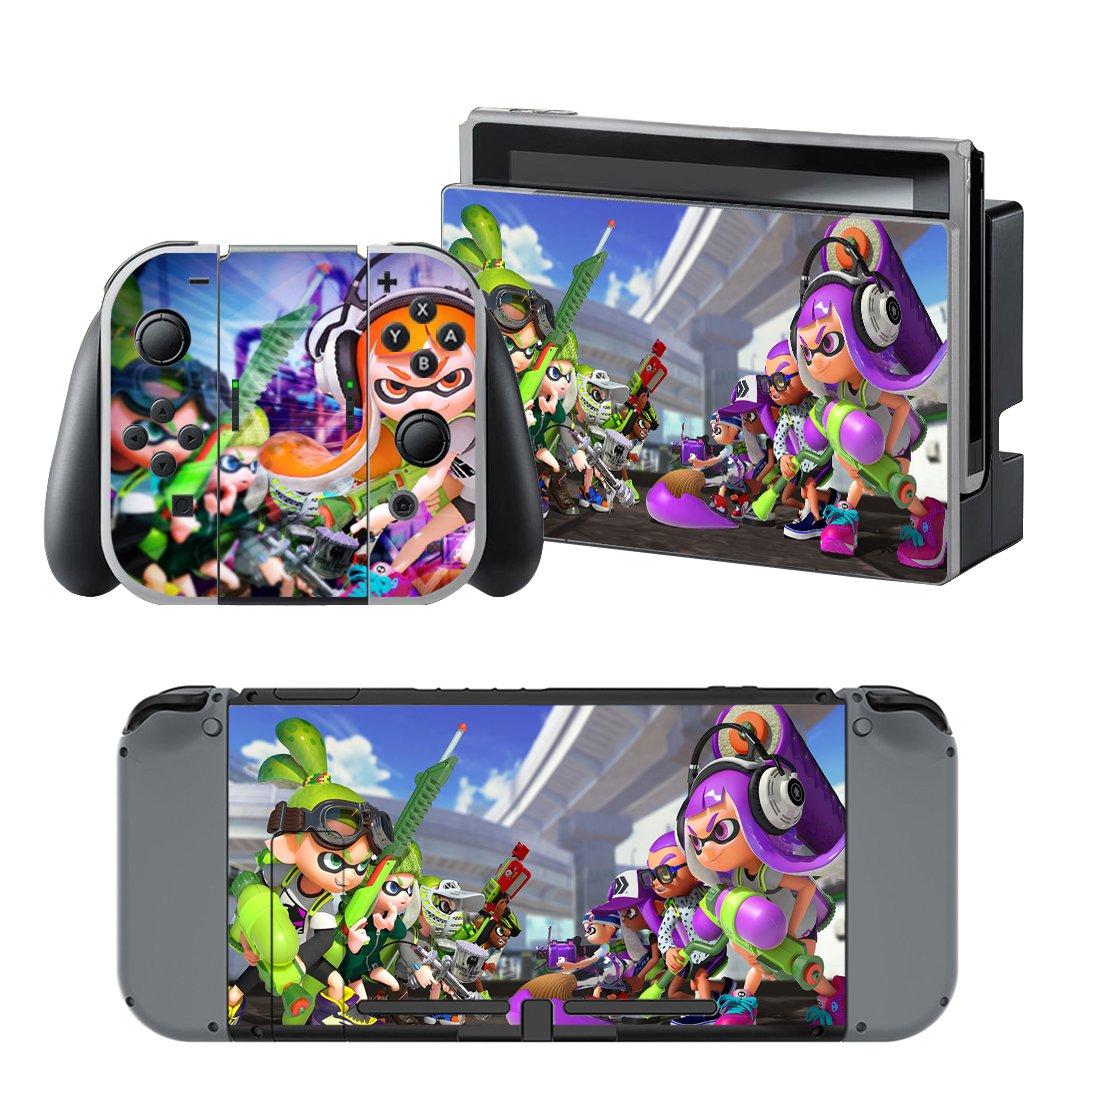 Splatoon design decal for Nintendo switch console sticker skin